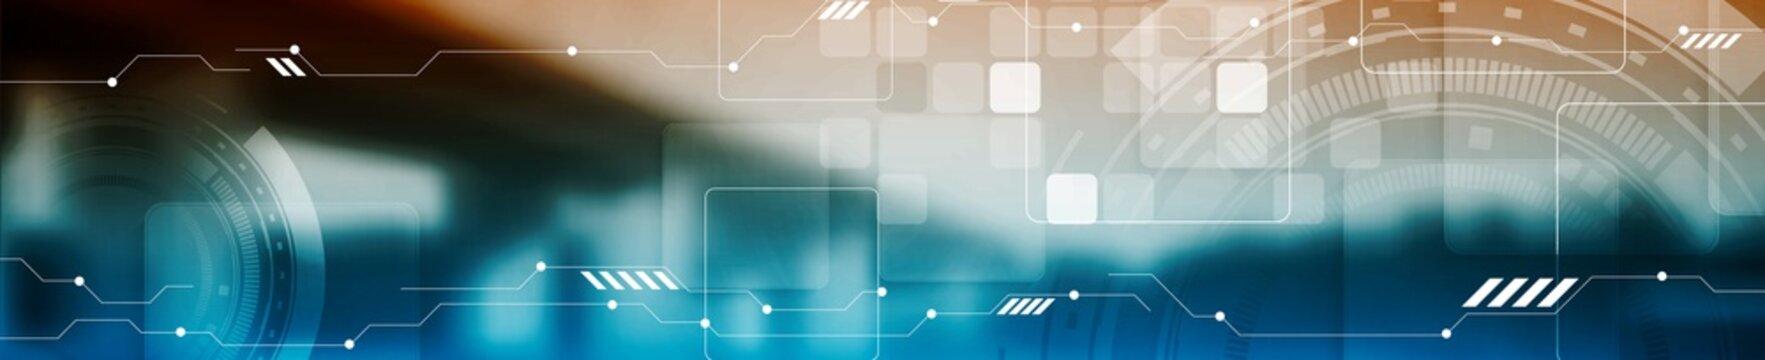 Abstract tech industrial web header banner